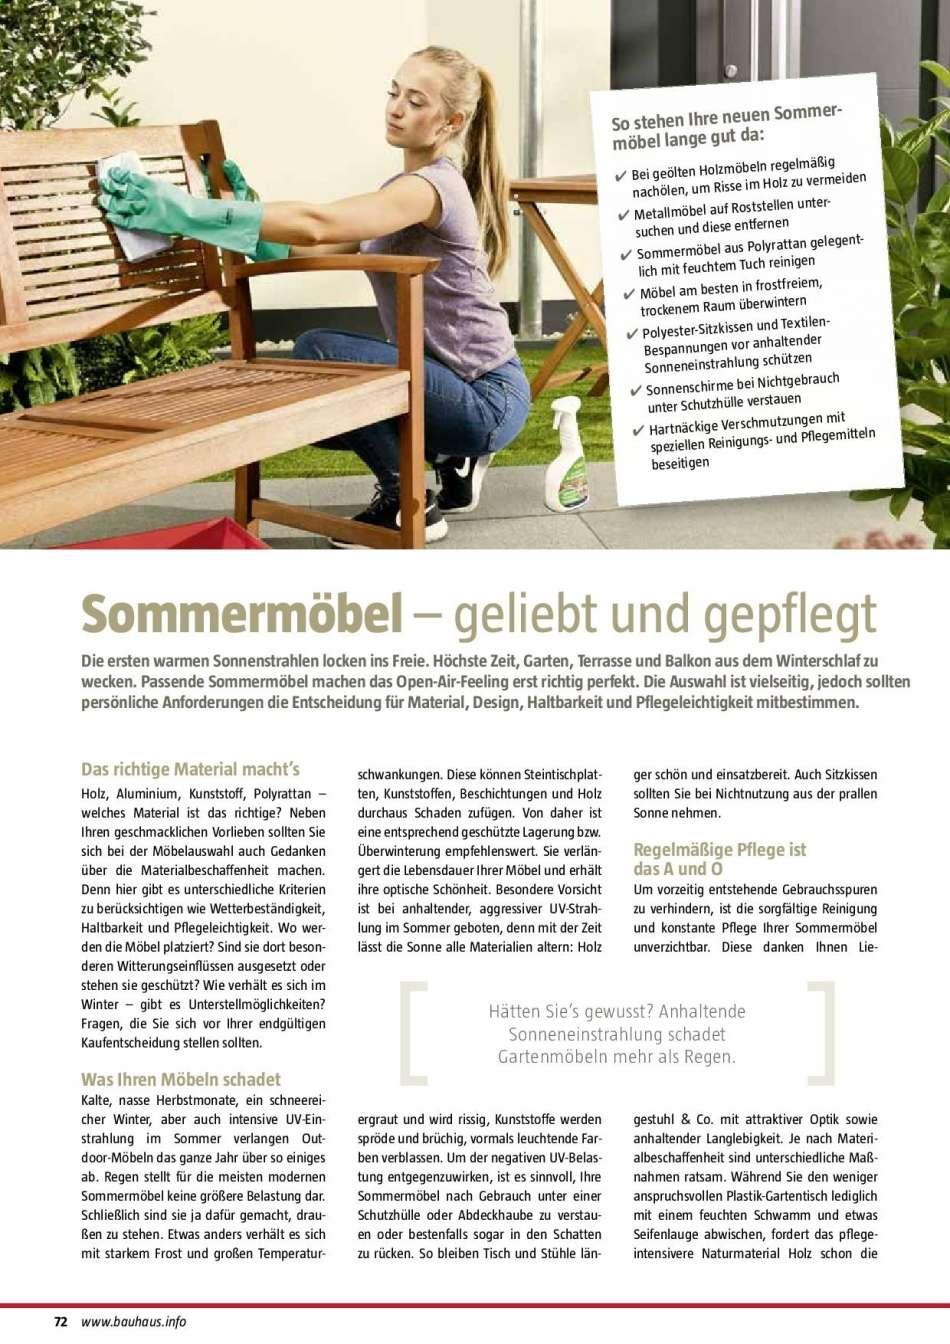 Full Size of Gartentisch Bauhaus Prospekt 2712020 3062020 Rabatt Kompass Fenster Wohnzimmer Gartentisch Bauhaus